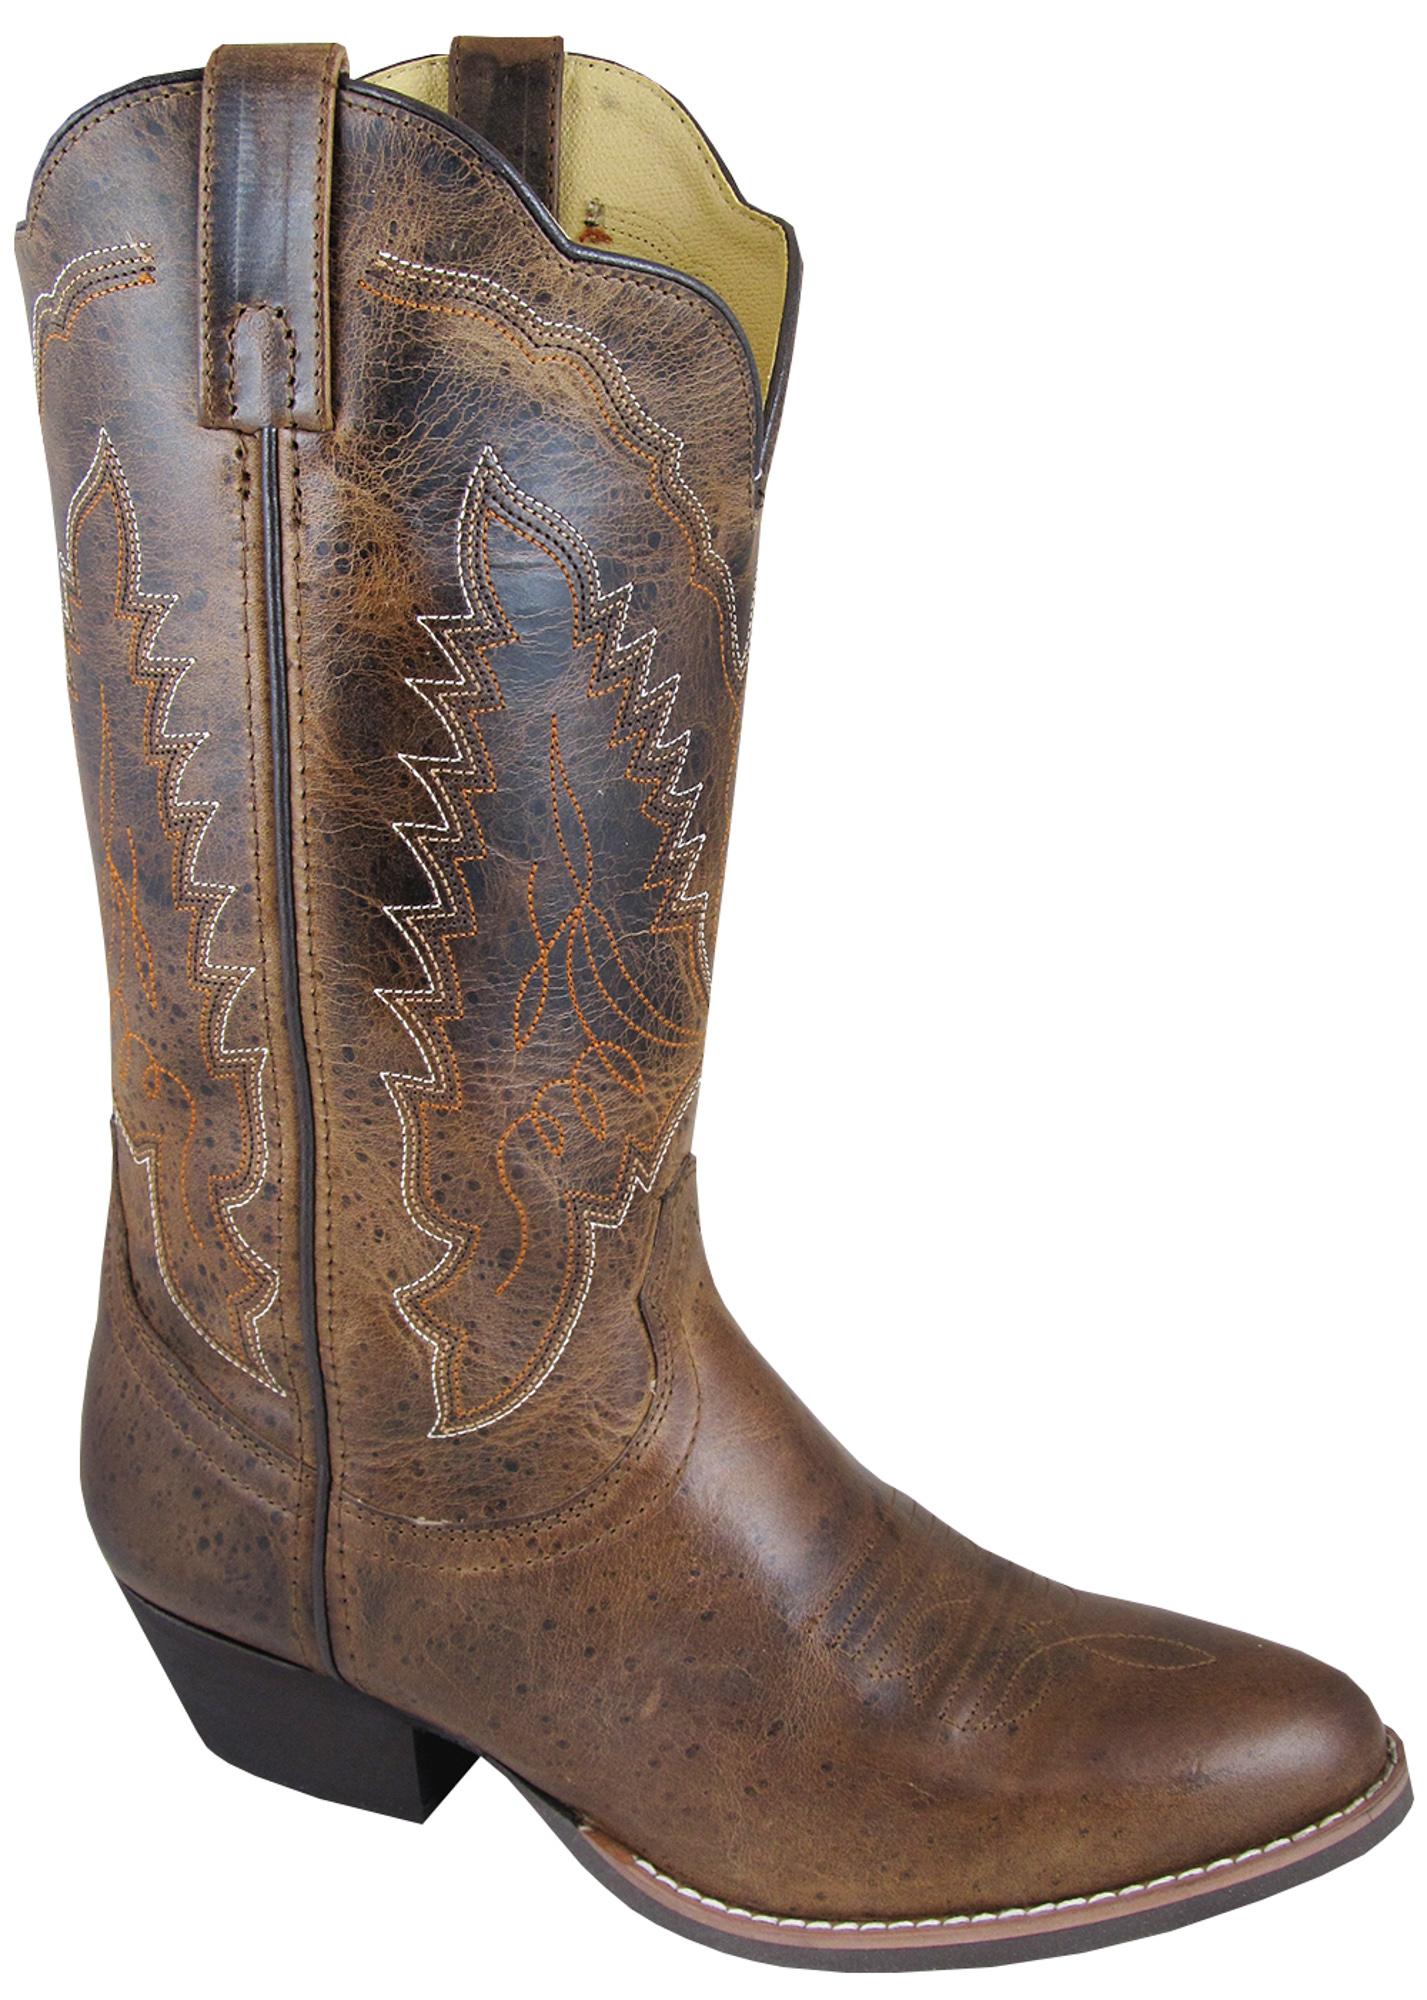 smoky mountain boots womens amelia brown distress leather